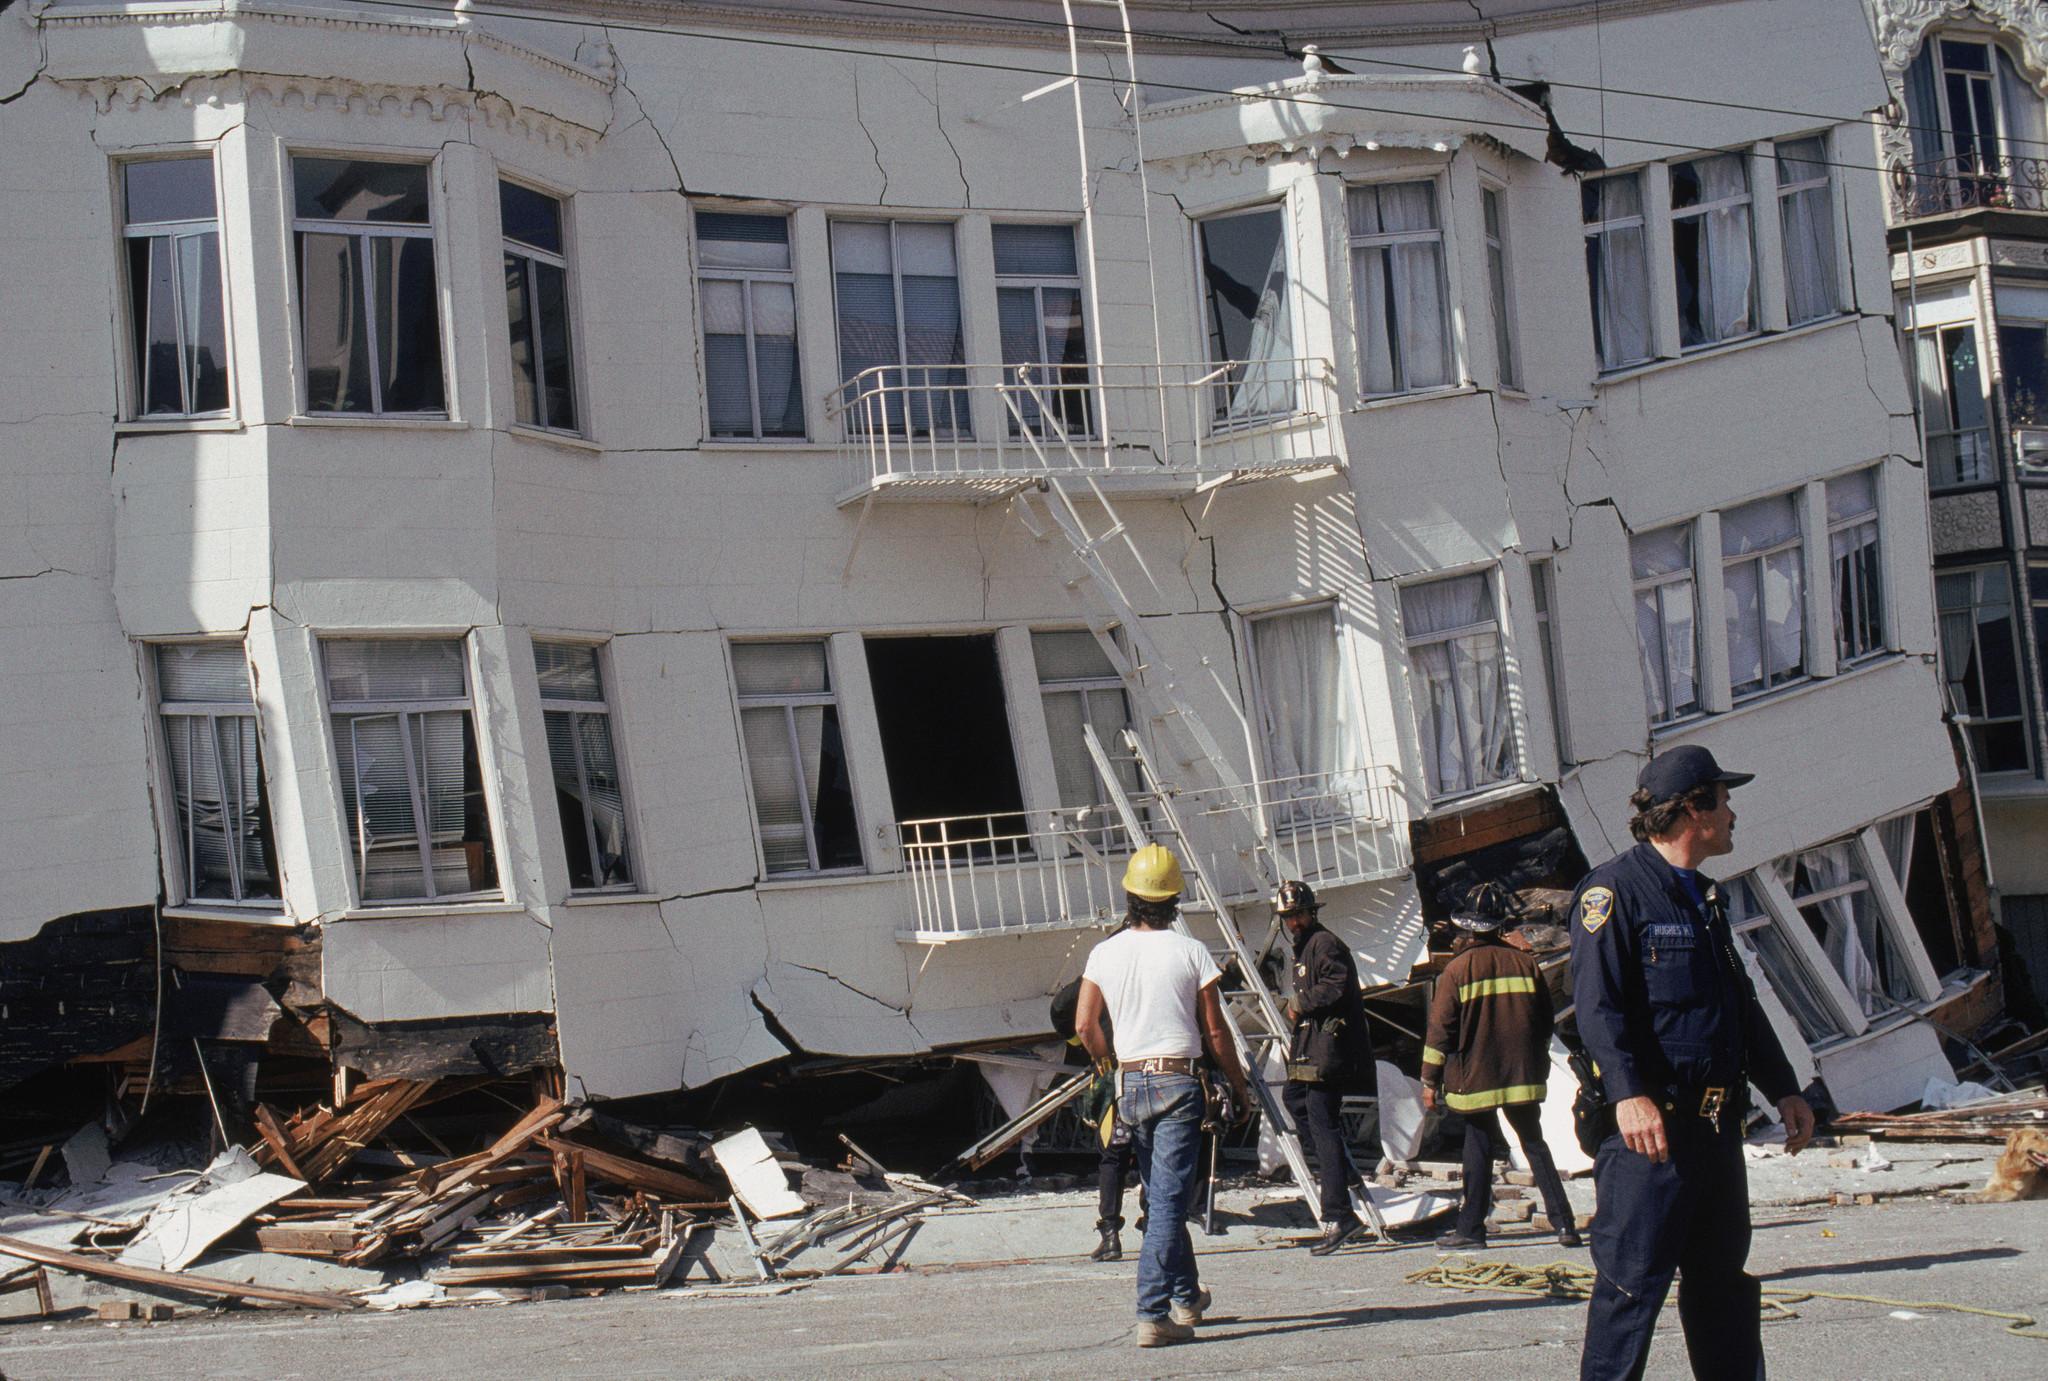 San Francisco Offers Lessons To L A On Quake Retrofitting